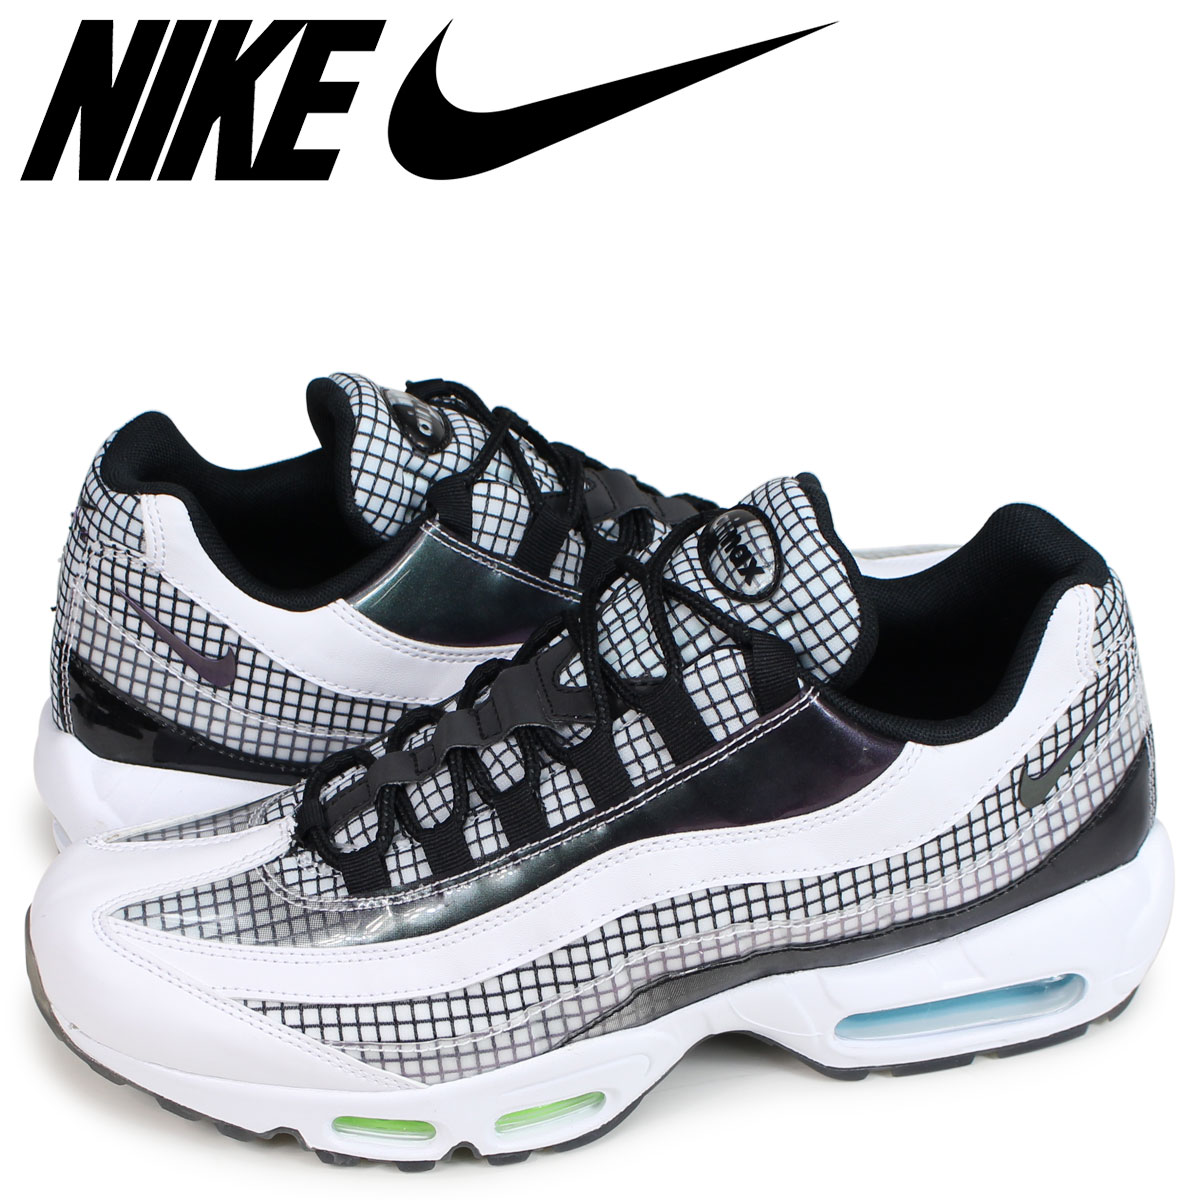 sports shoes fc58a f092b NIKE AIR MAX 95 LV8 Kie Ney AMAX 95 sneakers men white AO2450-100